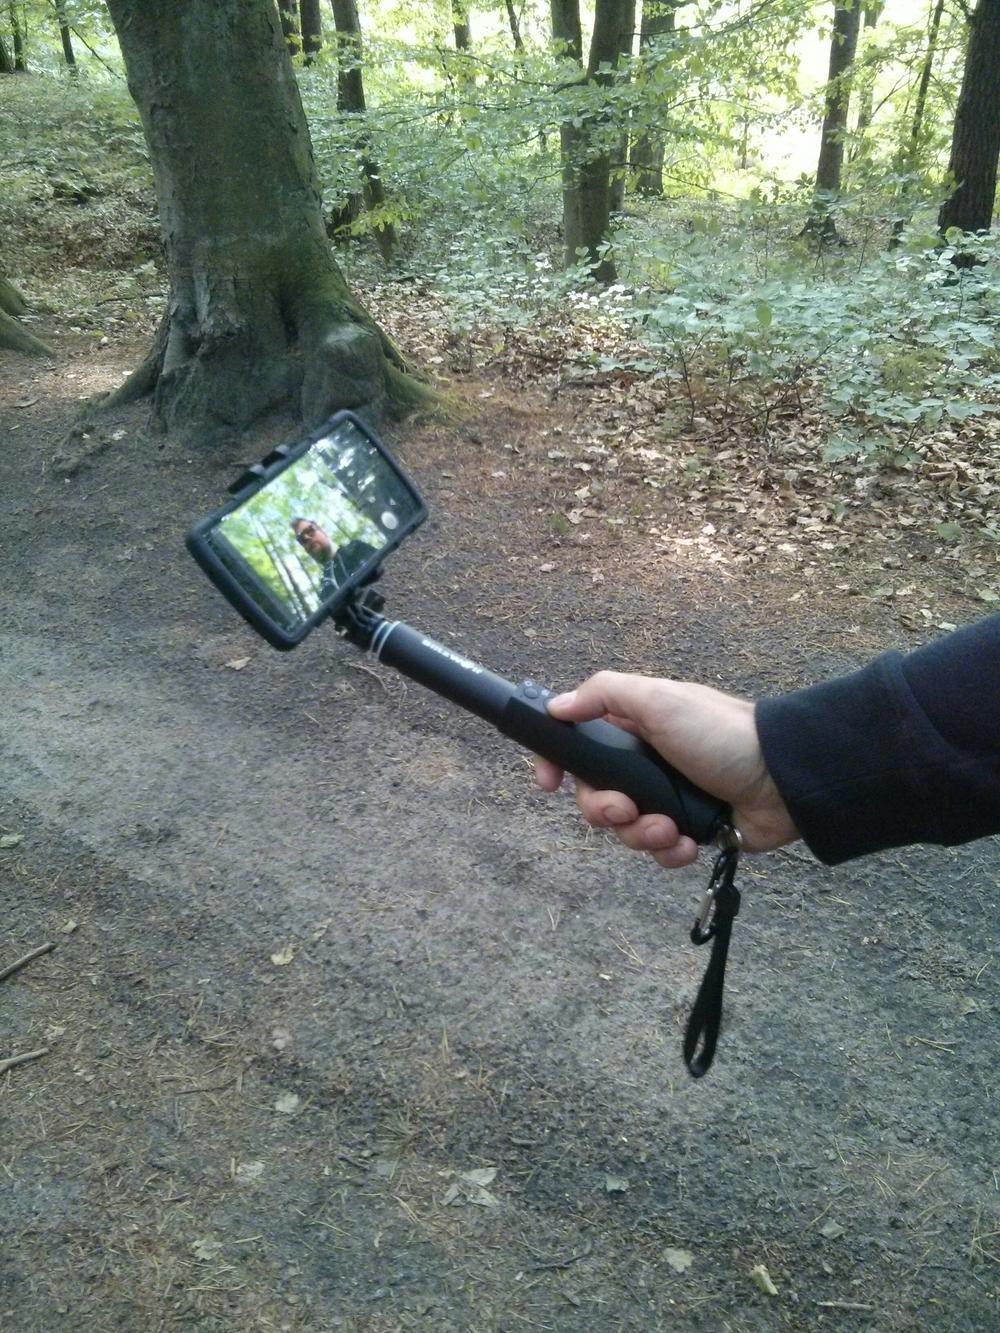 1_techfreak_blitzwolf_selfie_stick_test_tel_